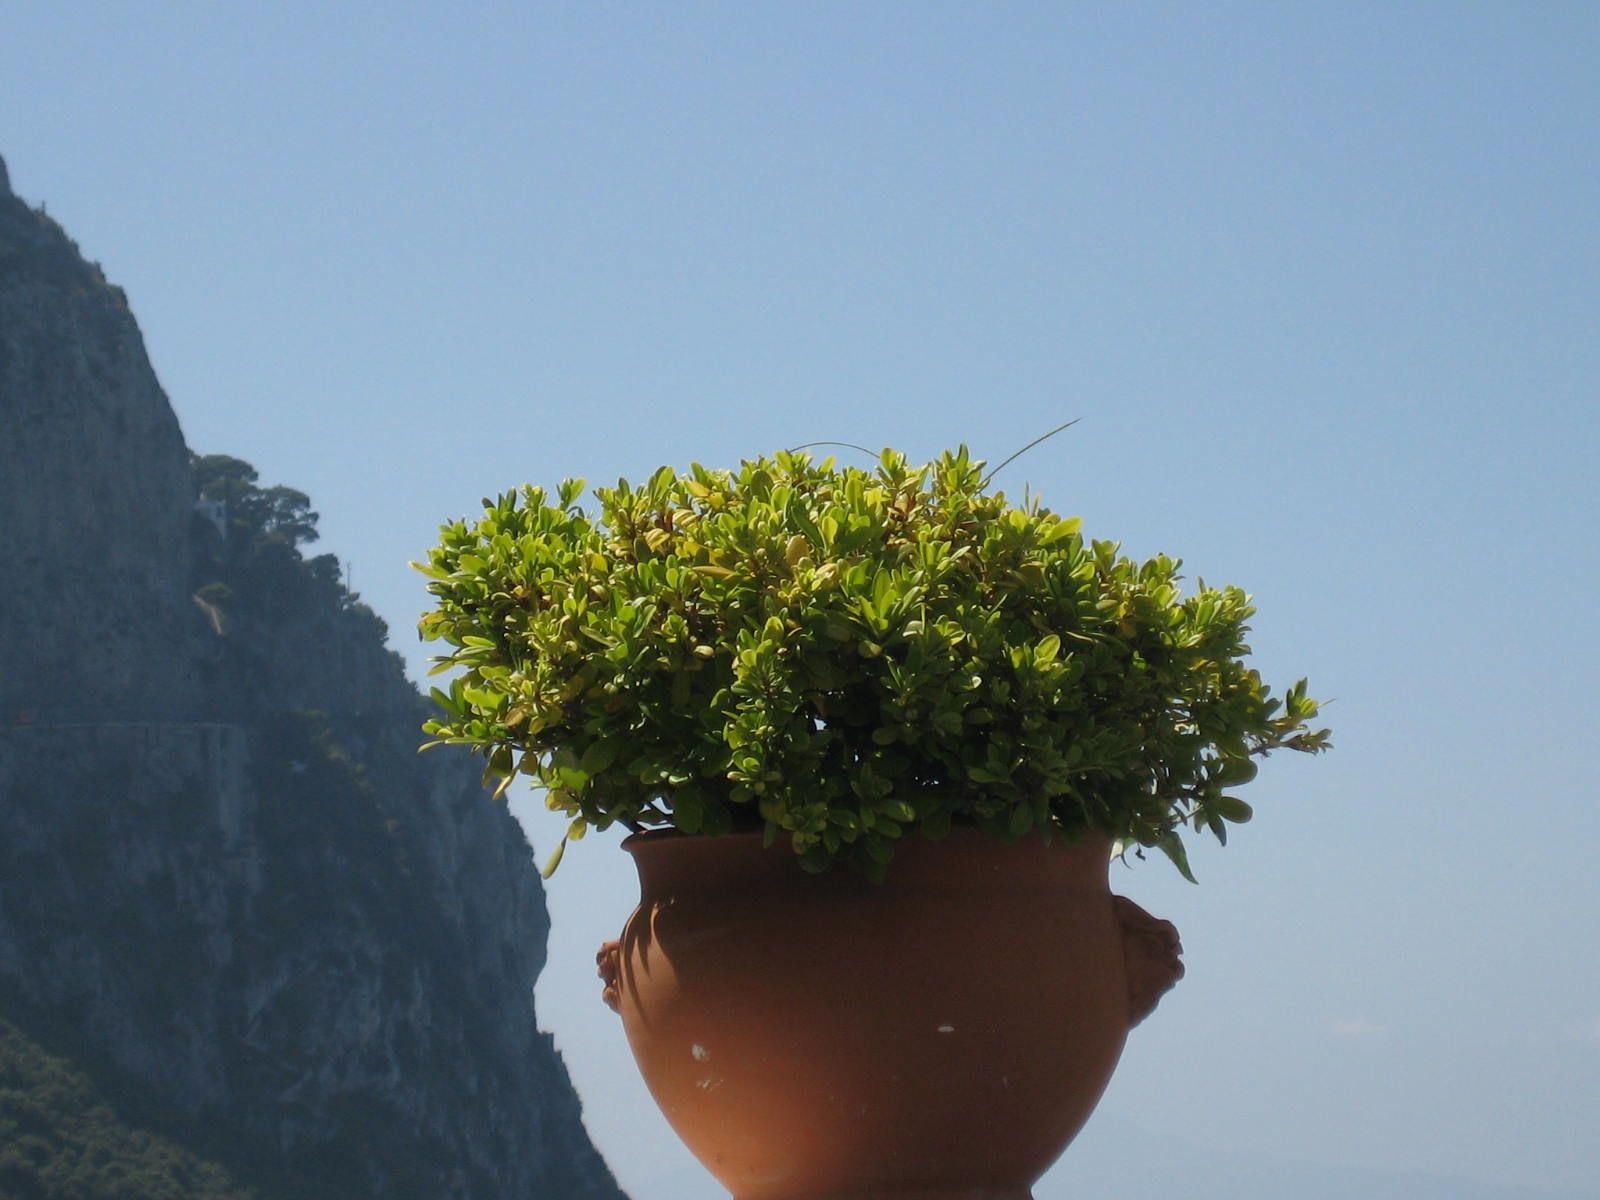 ... simply Capri!